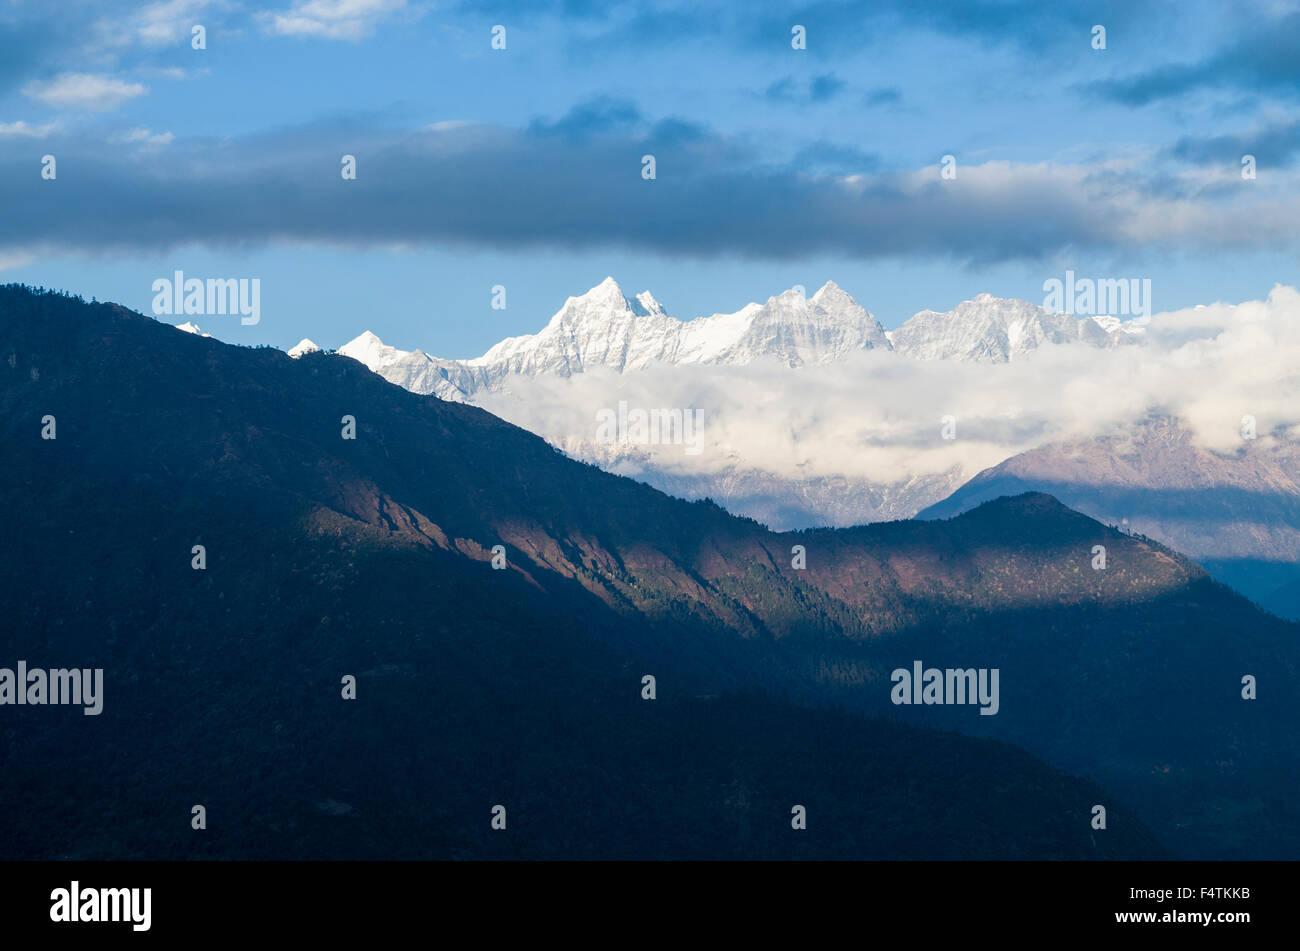 Shorang Himal mountain range seen from Taksindu La - Stock Image